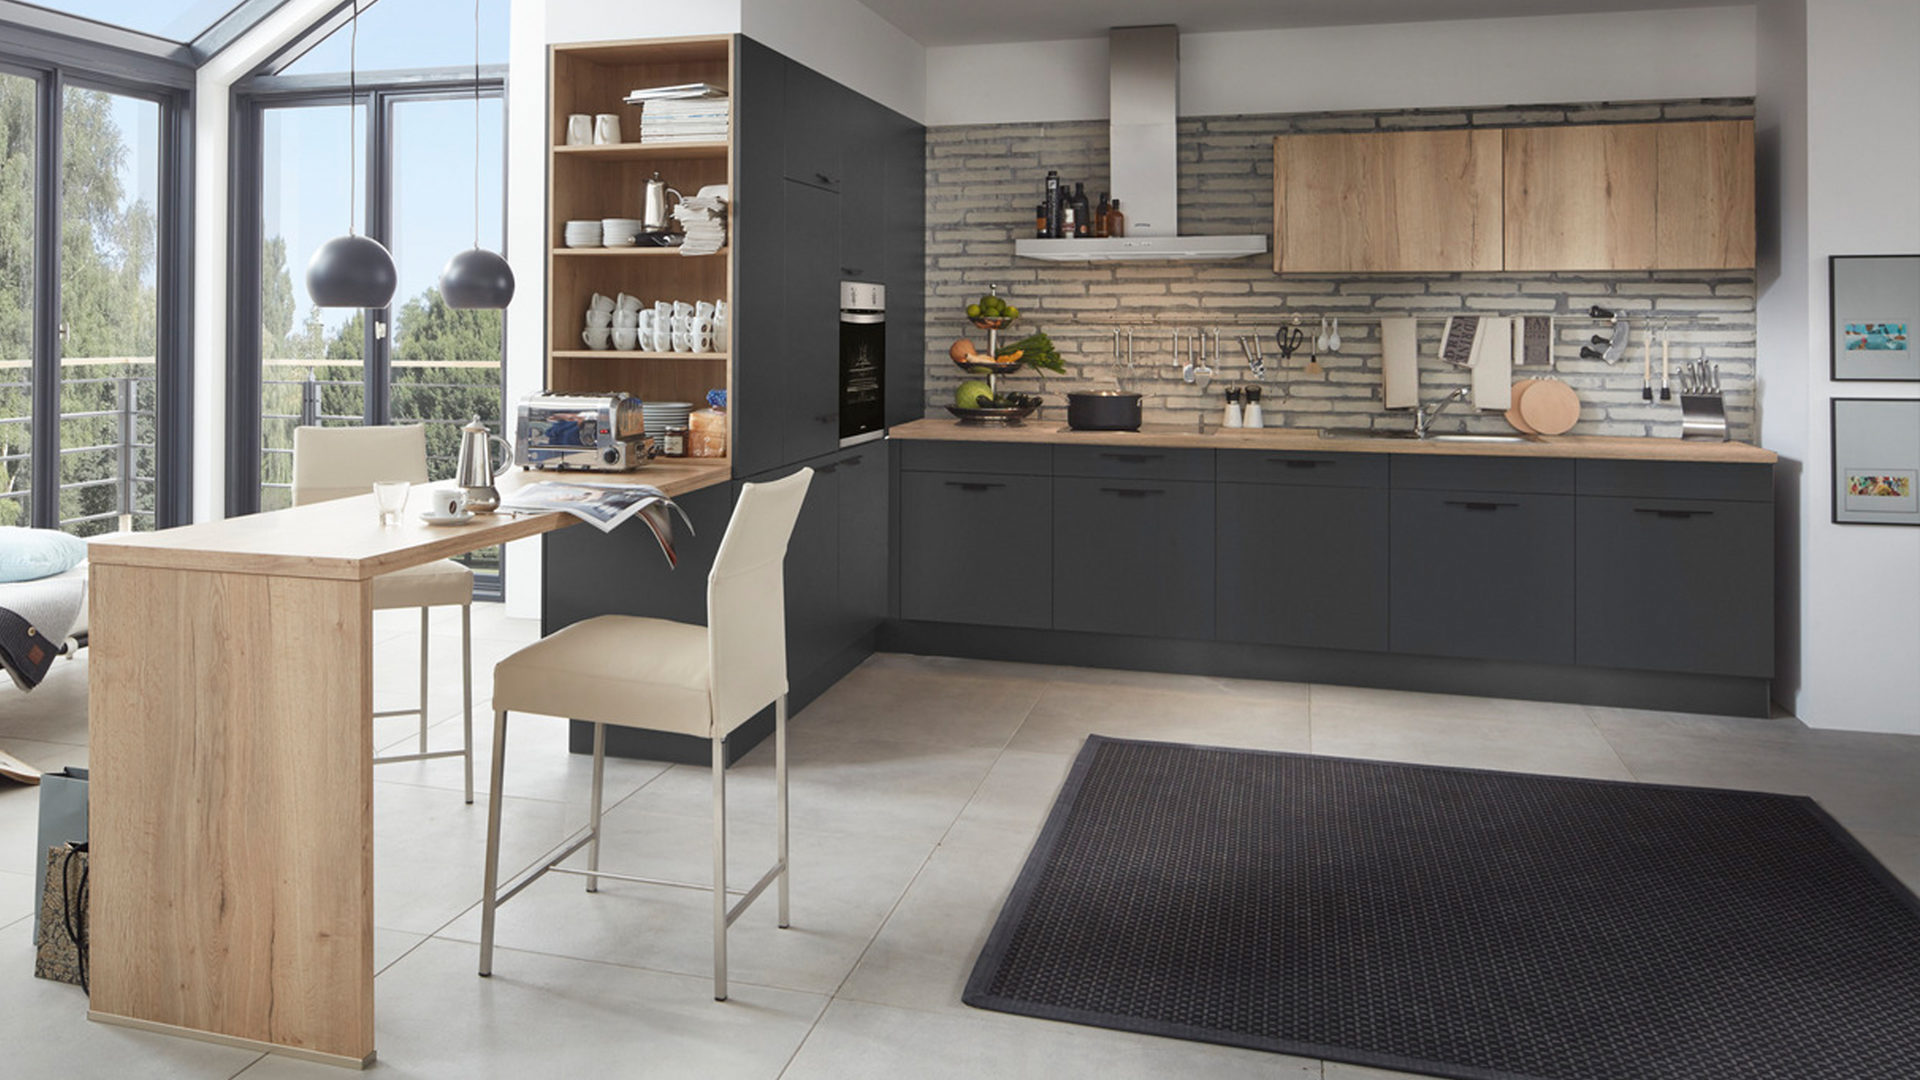 Küchen Coesfeld möbel boer coesfeld räume küche einbauküche einbauküche mit